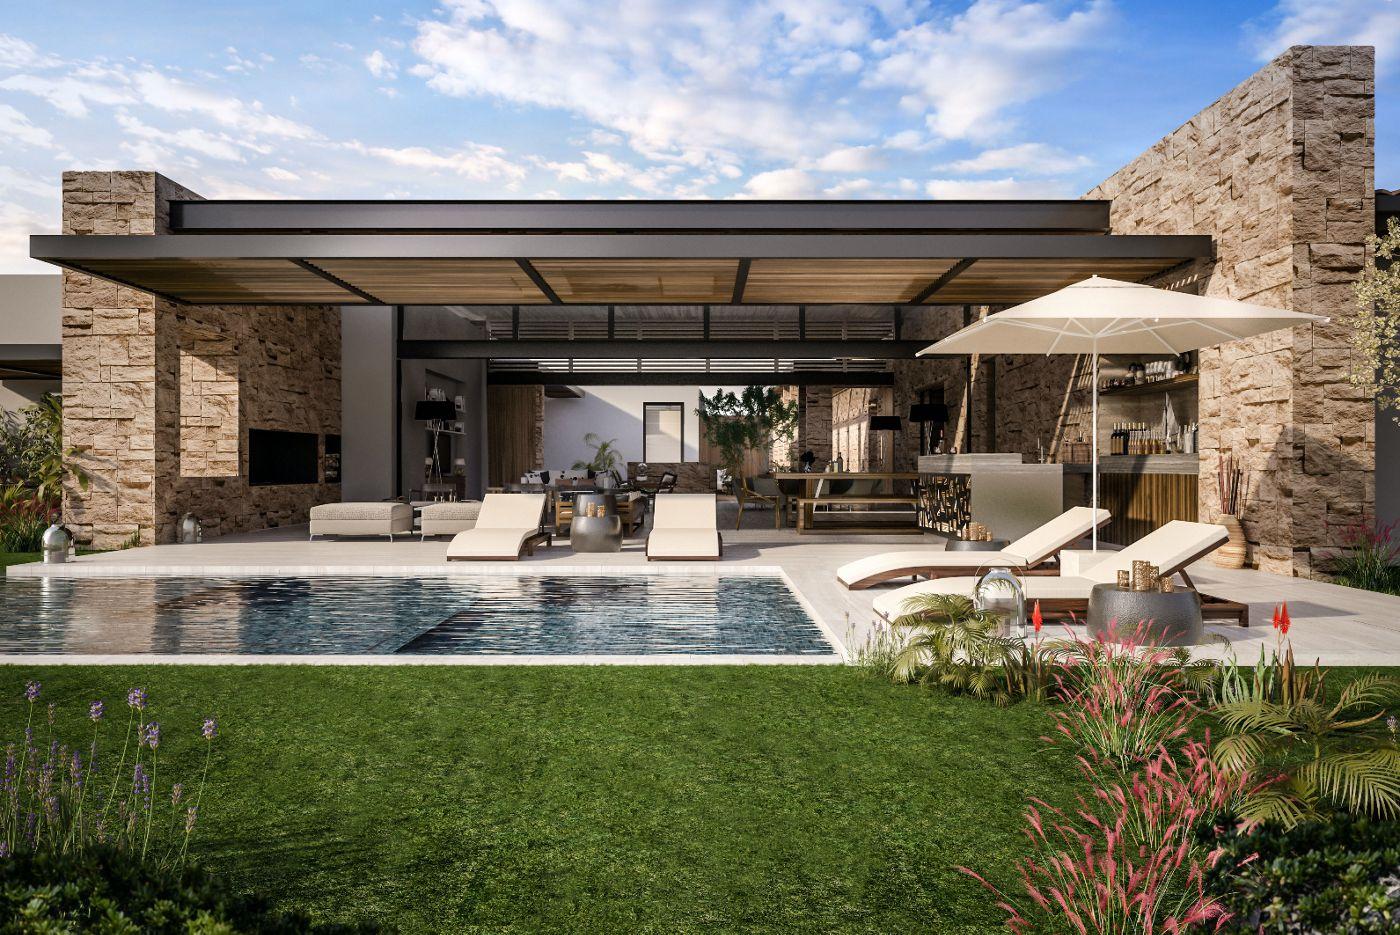 Los Cabos_Exterior_pool view (hires).jpeg